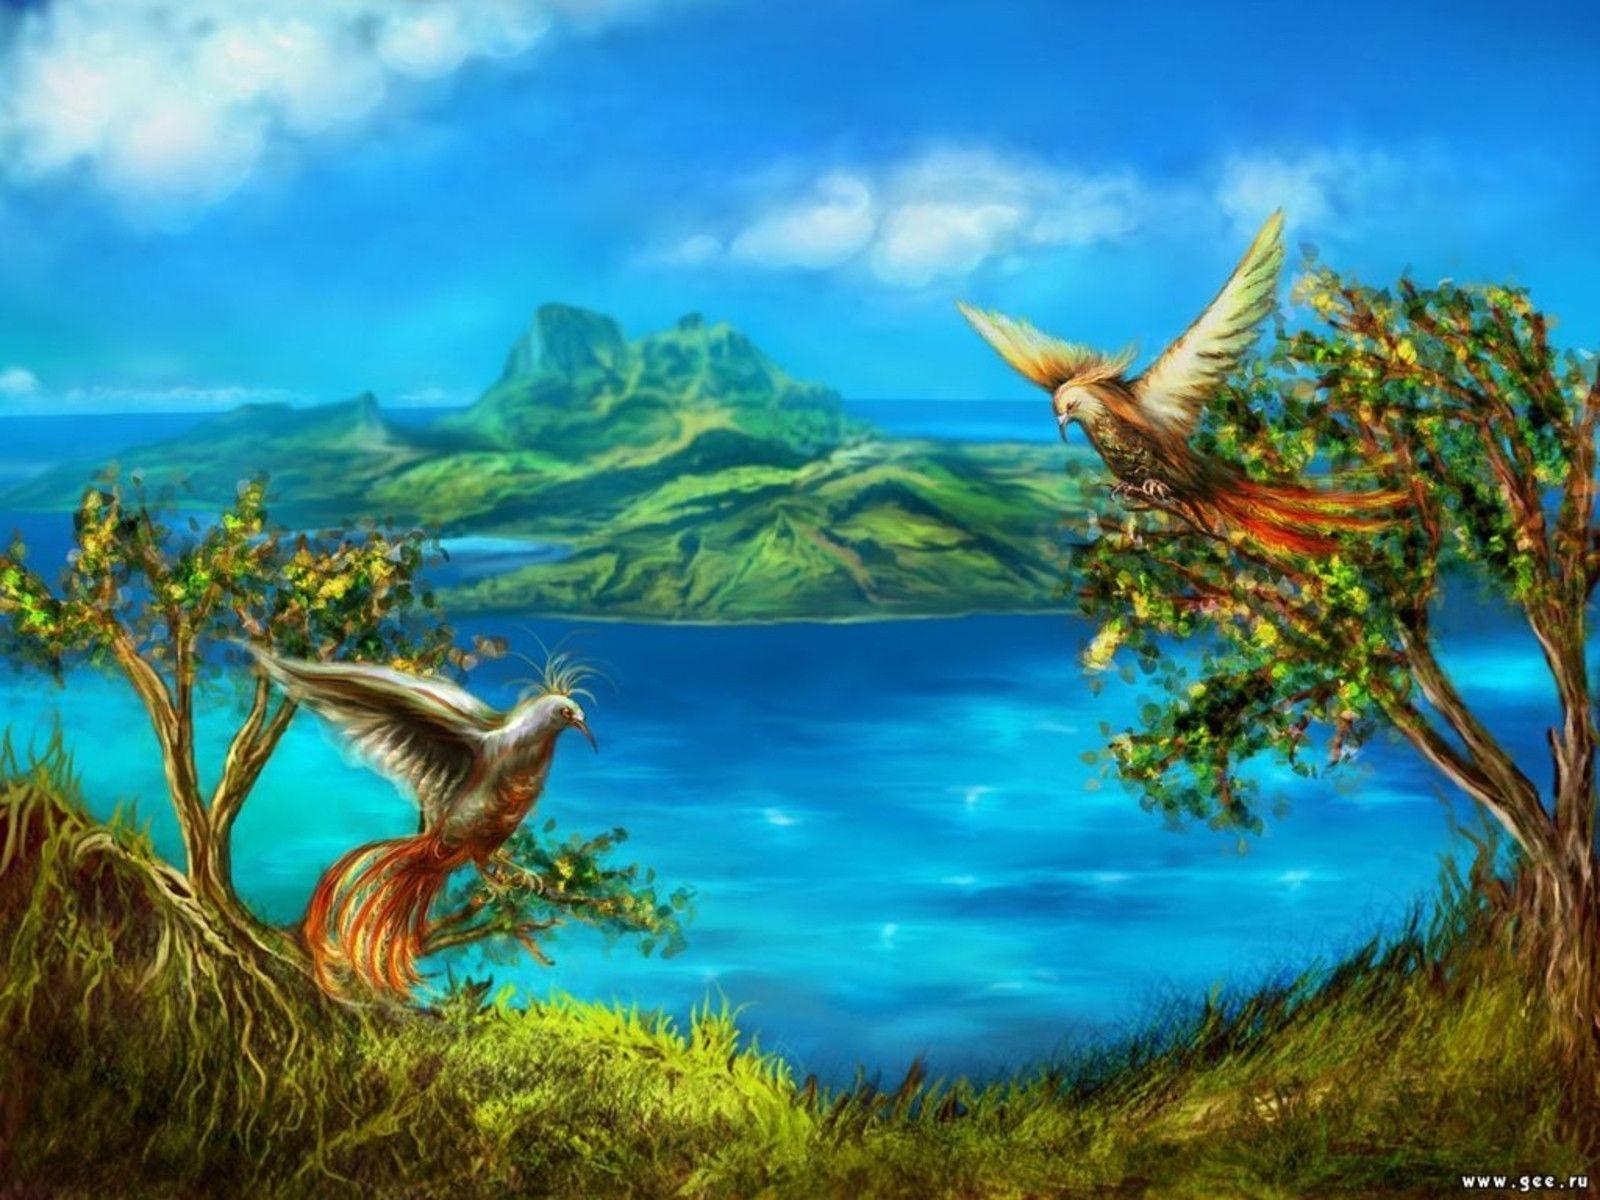 NATURE DIGITAL ART HD WALLPAPERS   FREE HD WALLPAPERS  Nature Background Art